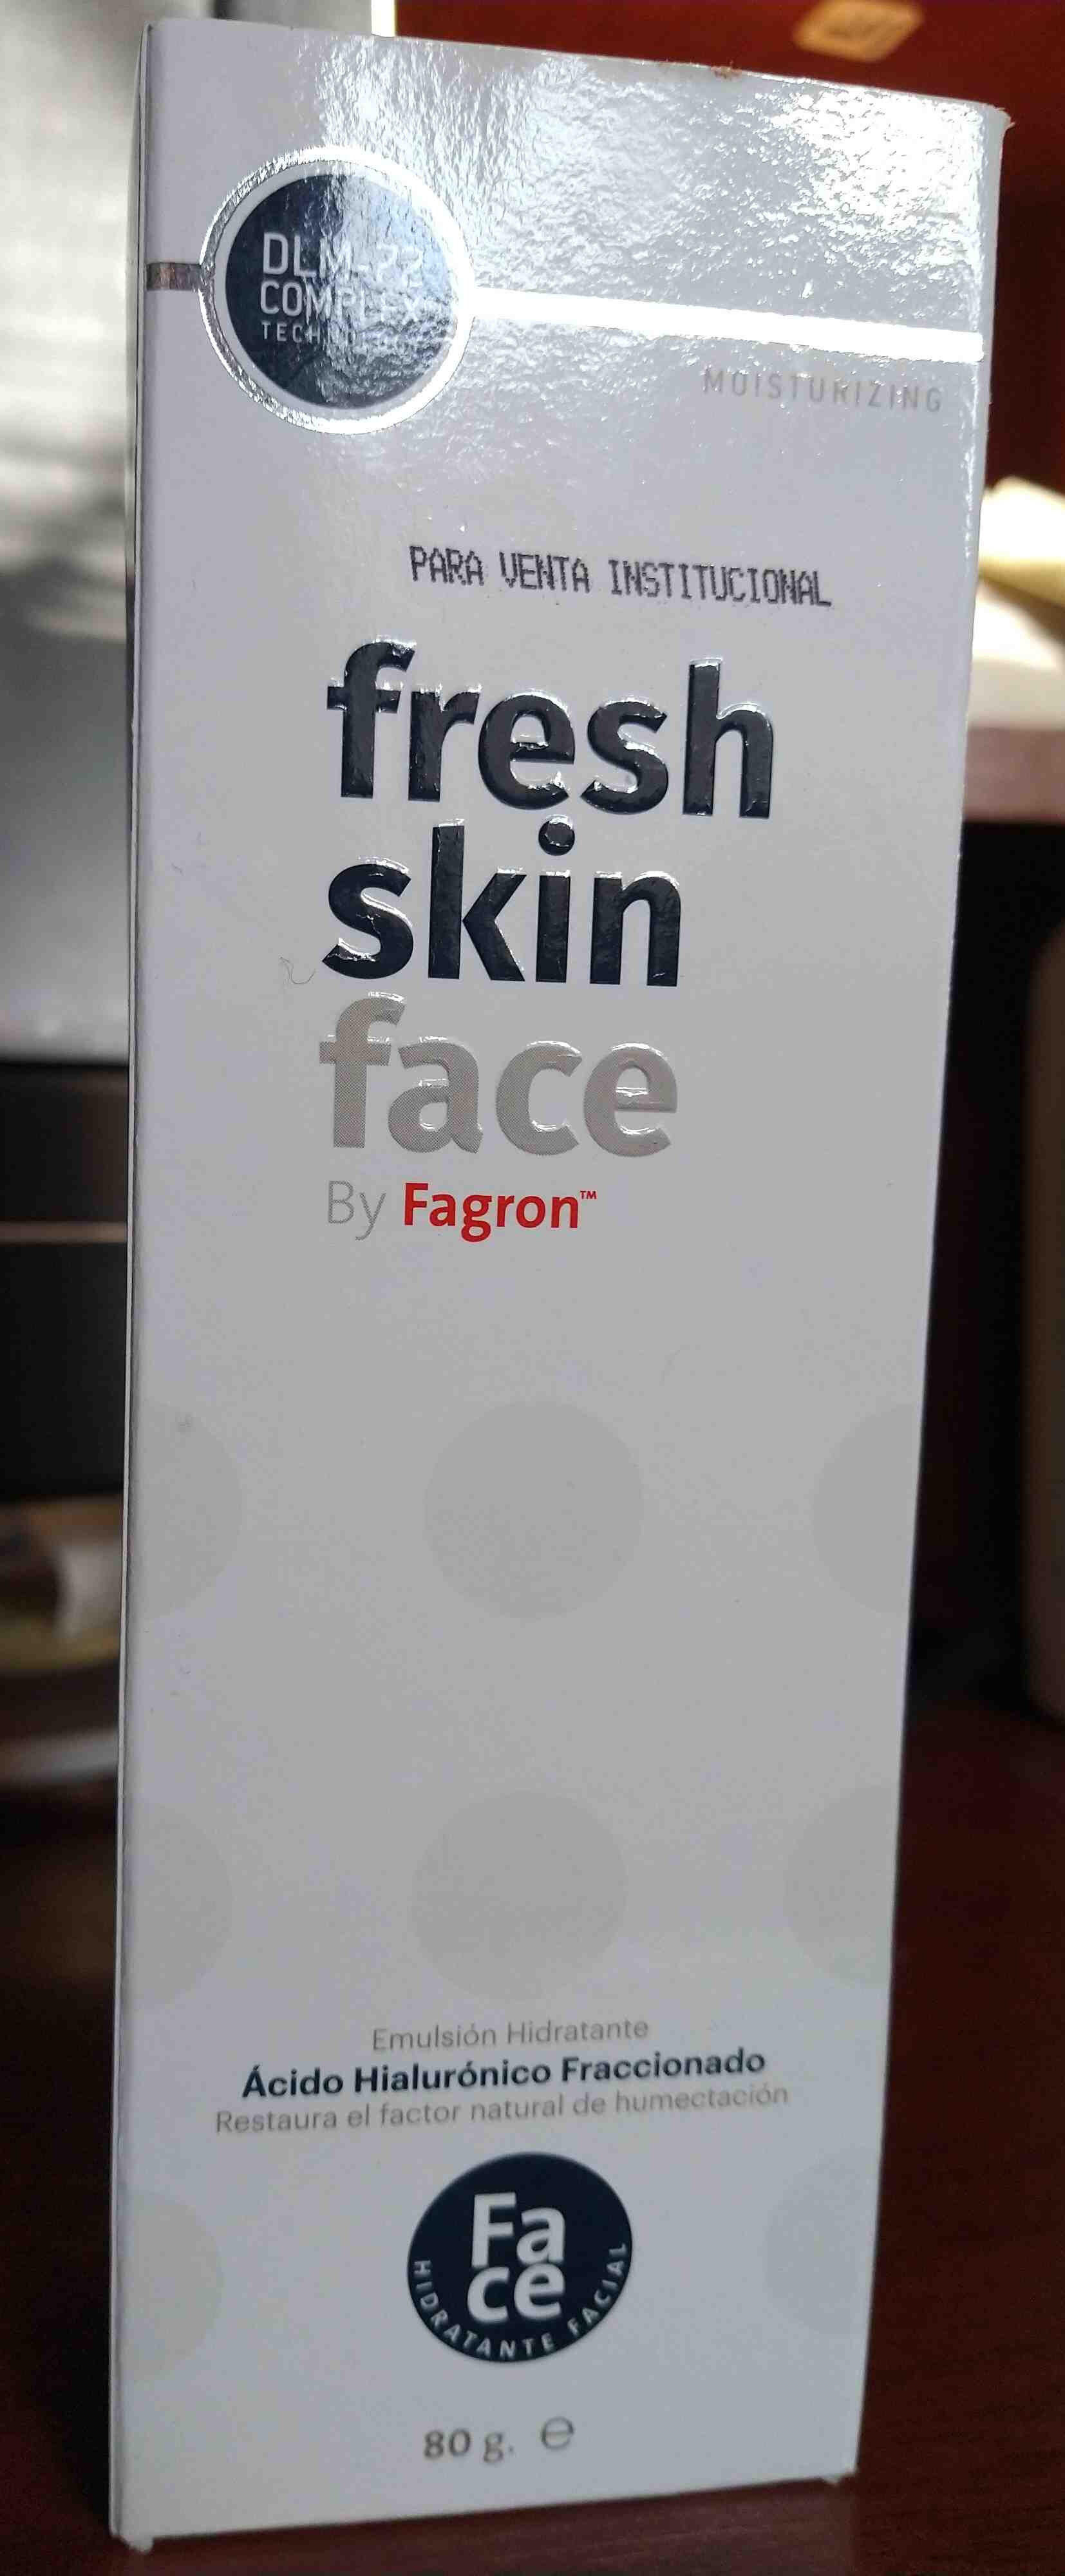 fresh skin face - Product - en